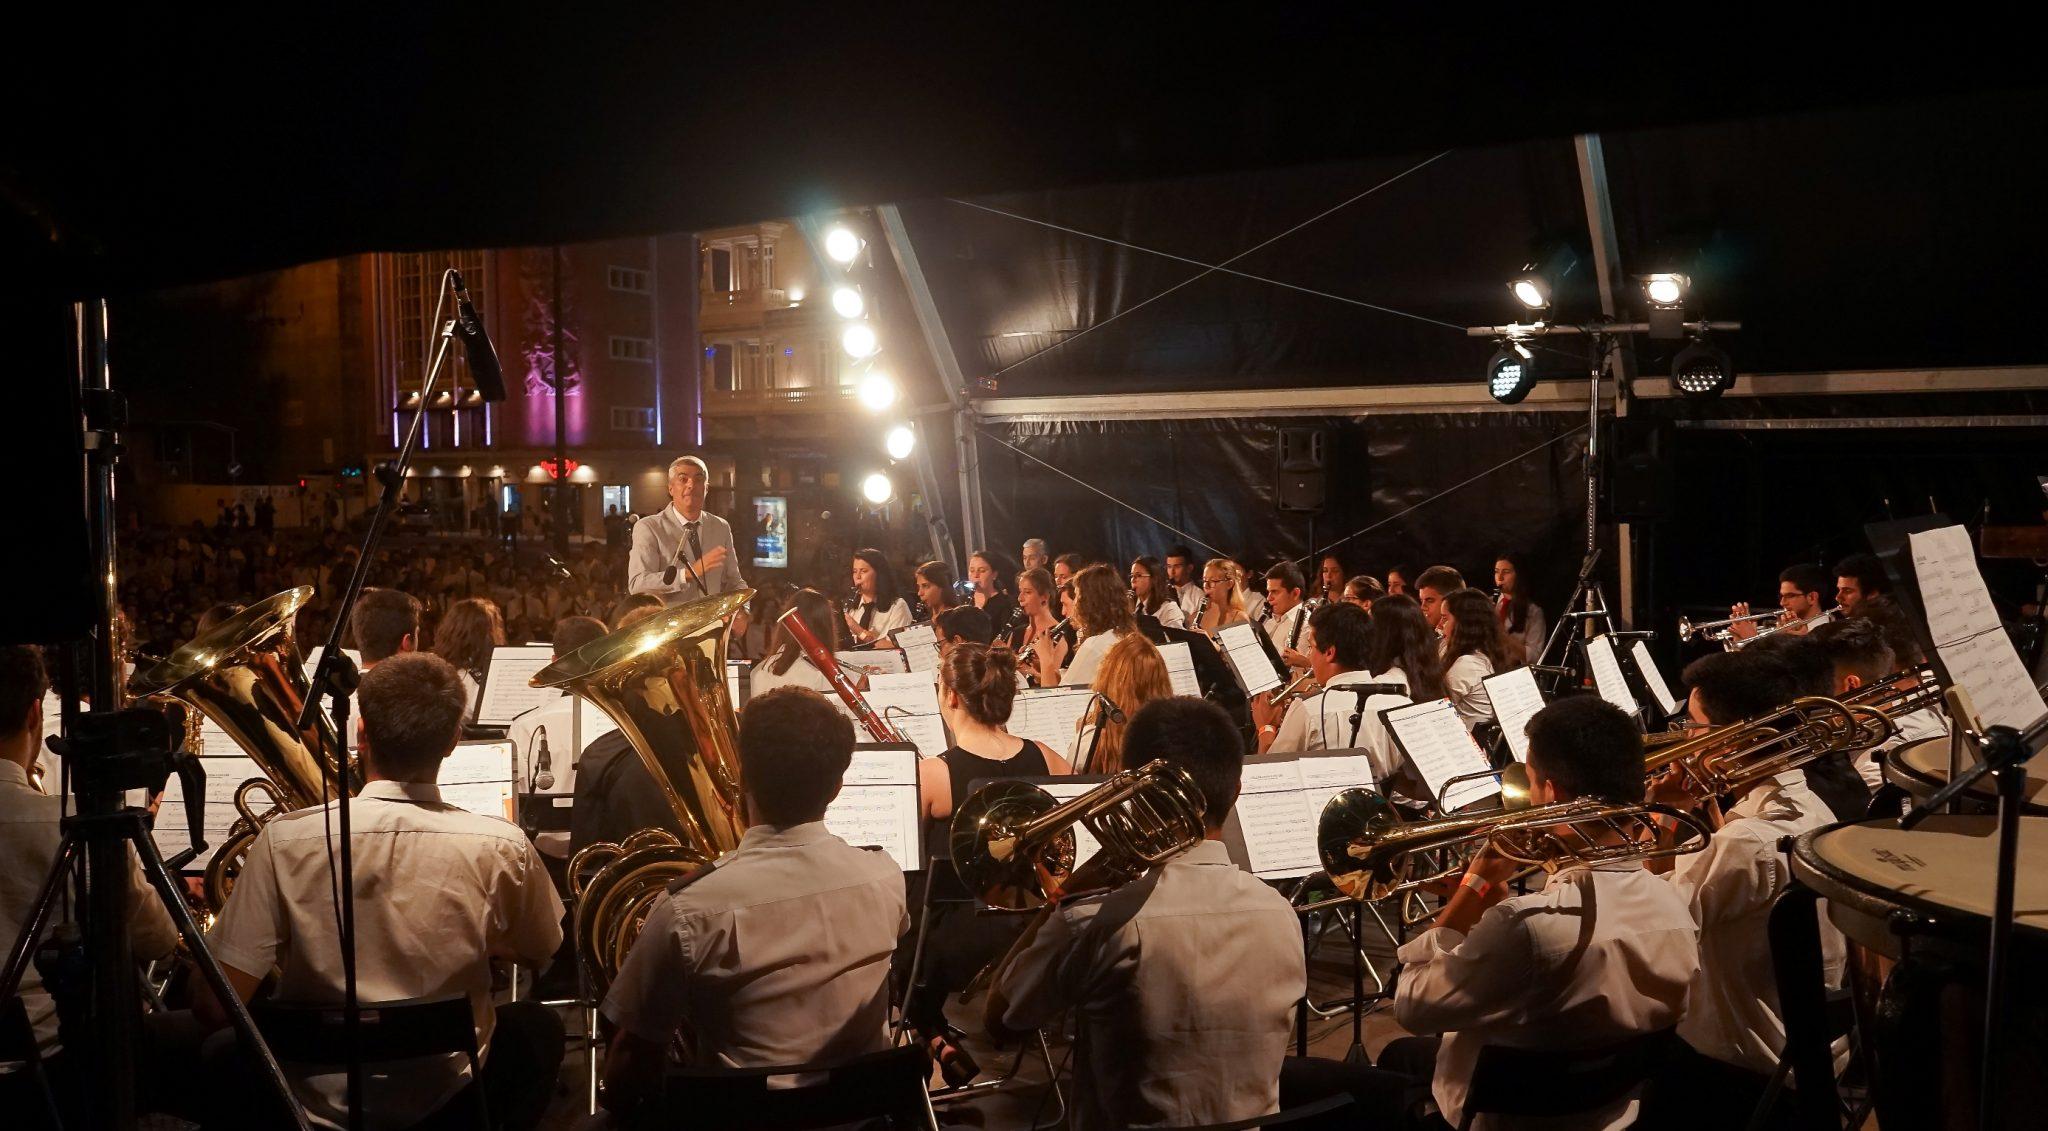 Vista do concerto da banda filarmónica a partir do interior do palco. De frente para o observador, o maestro de casaco cinza dirige os músicos.